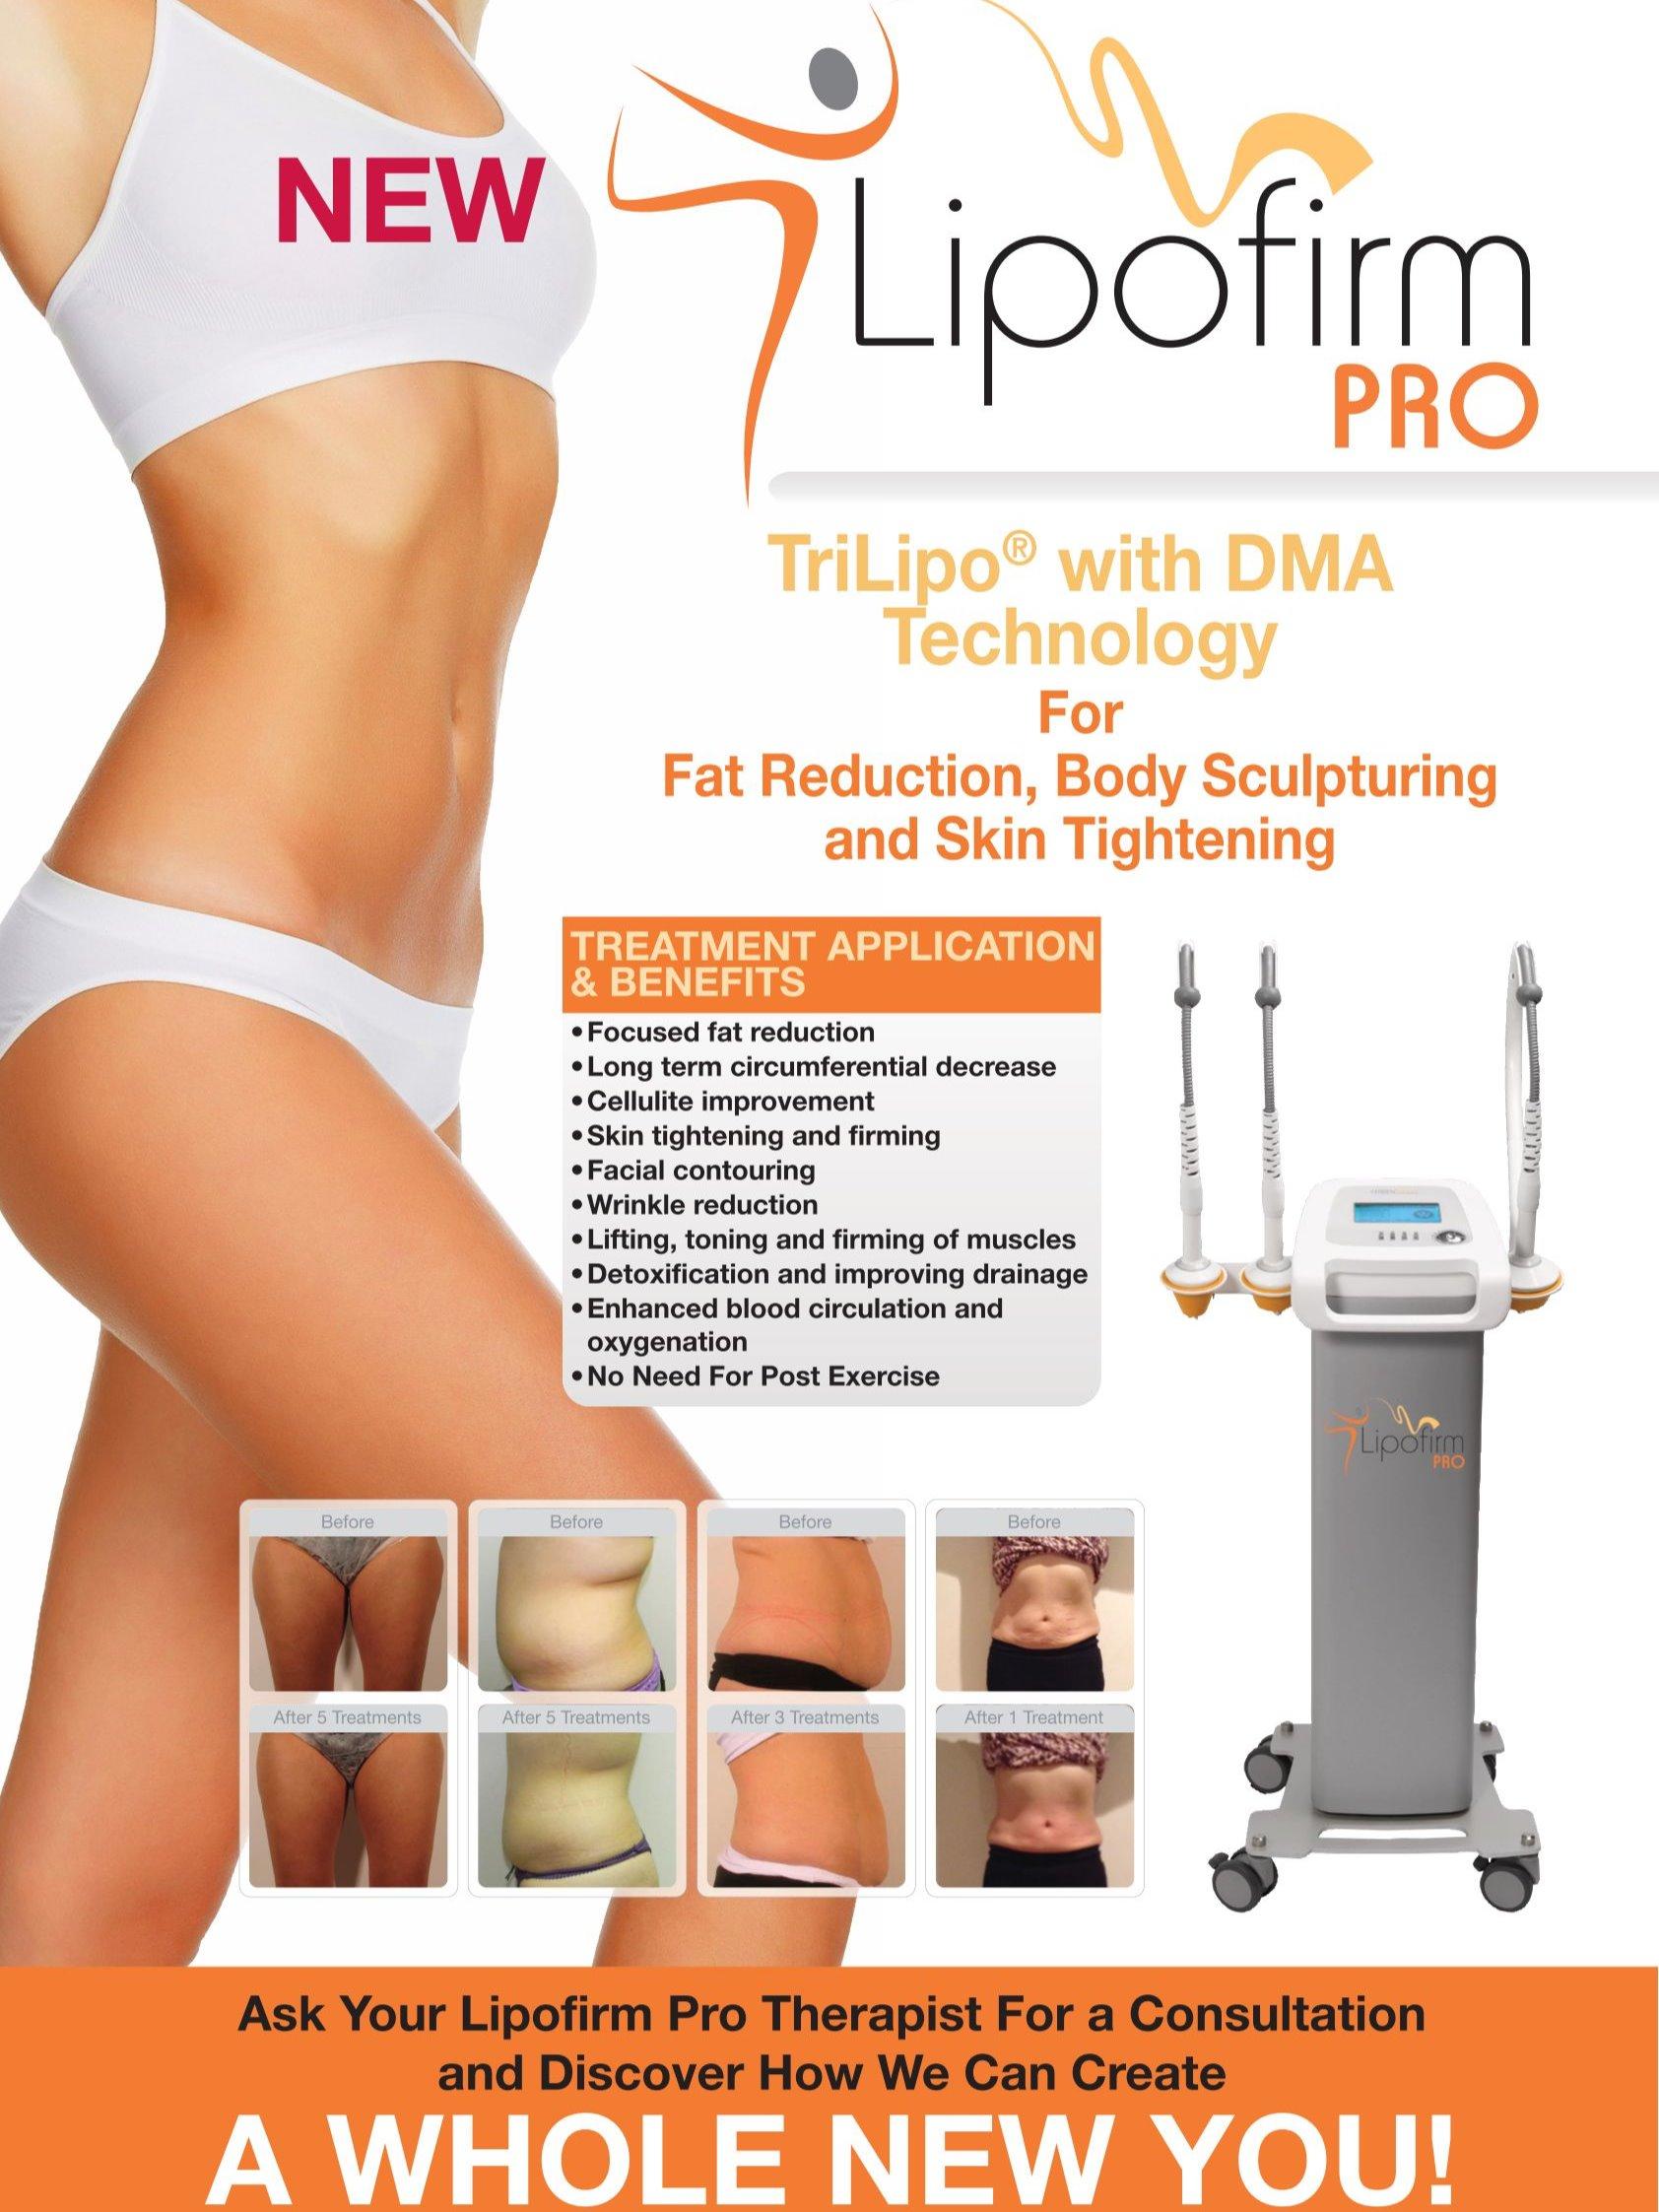 Lipofirm Pro